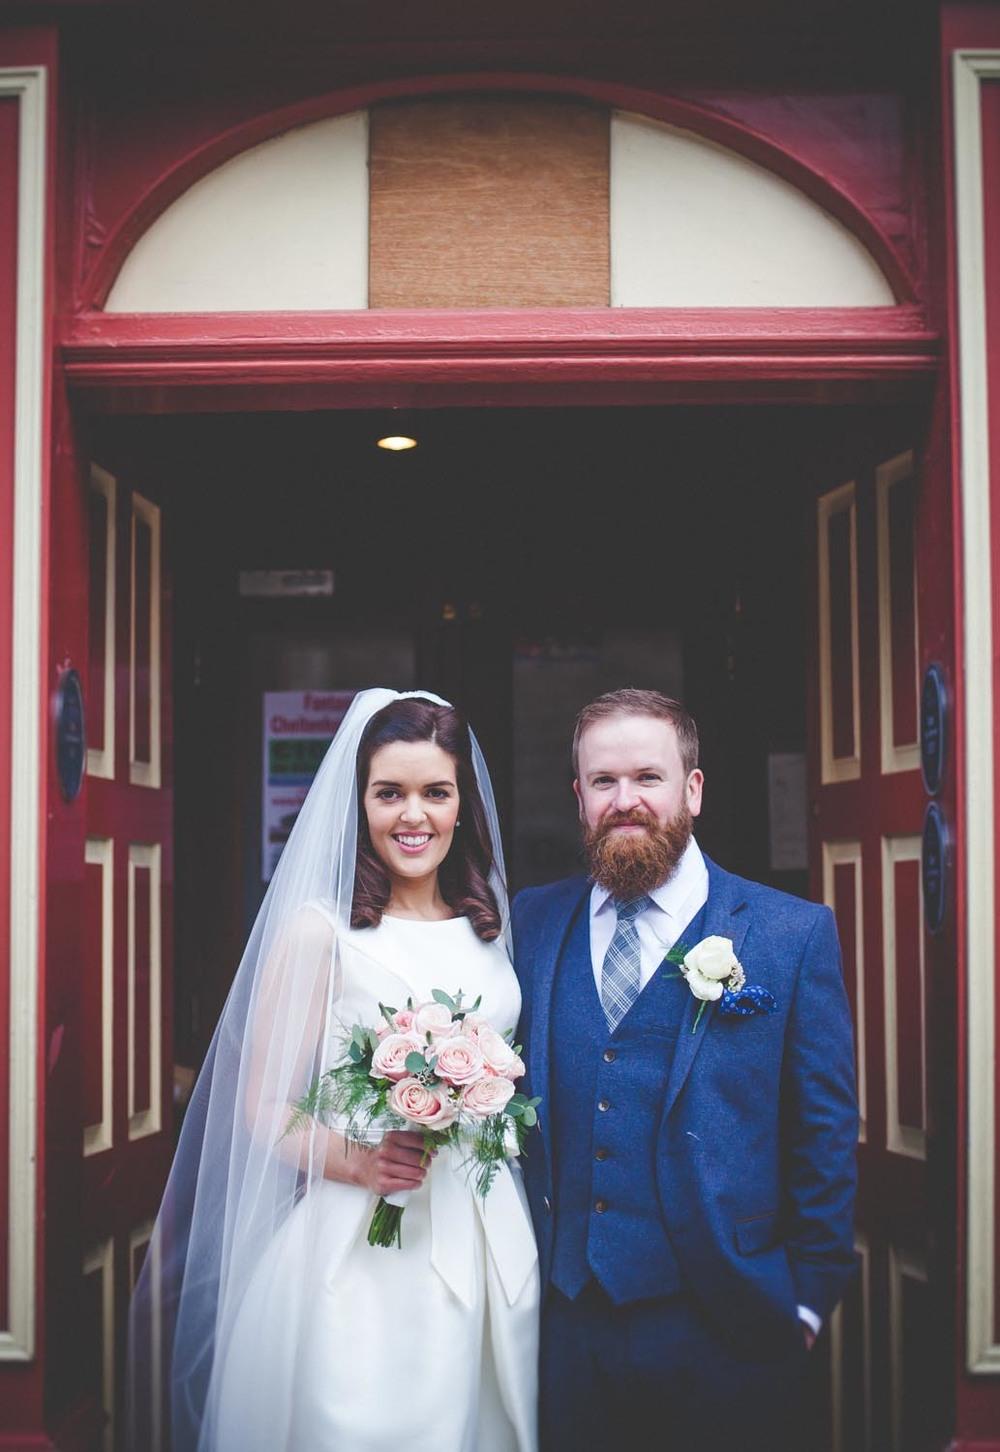 Step House wedding photographer Carlow Borris081.jpg